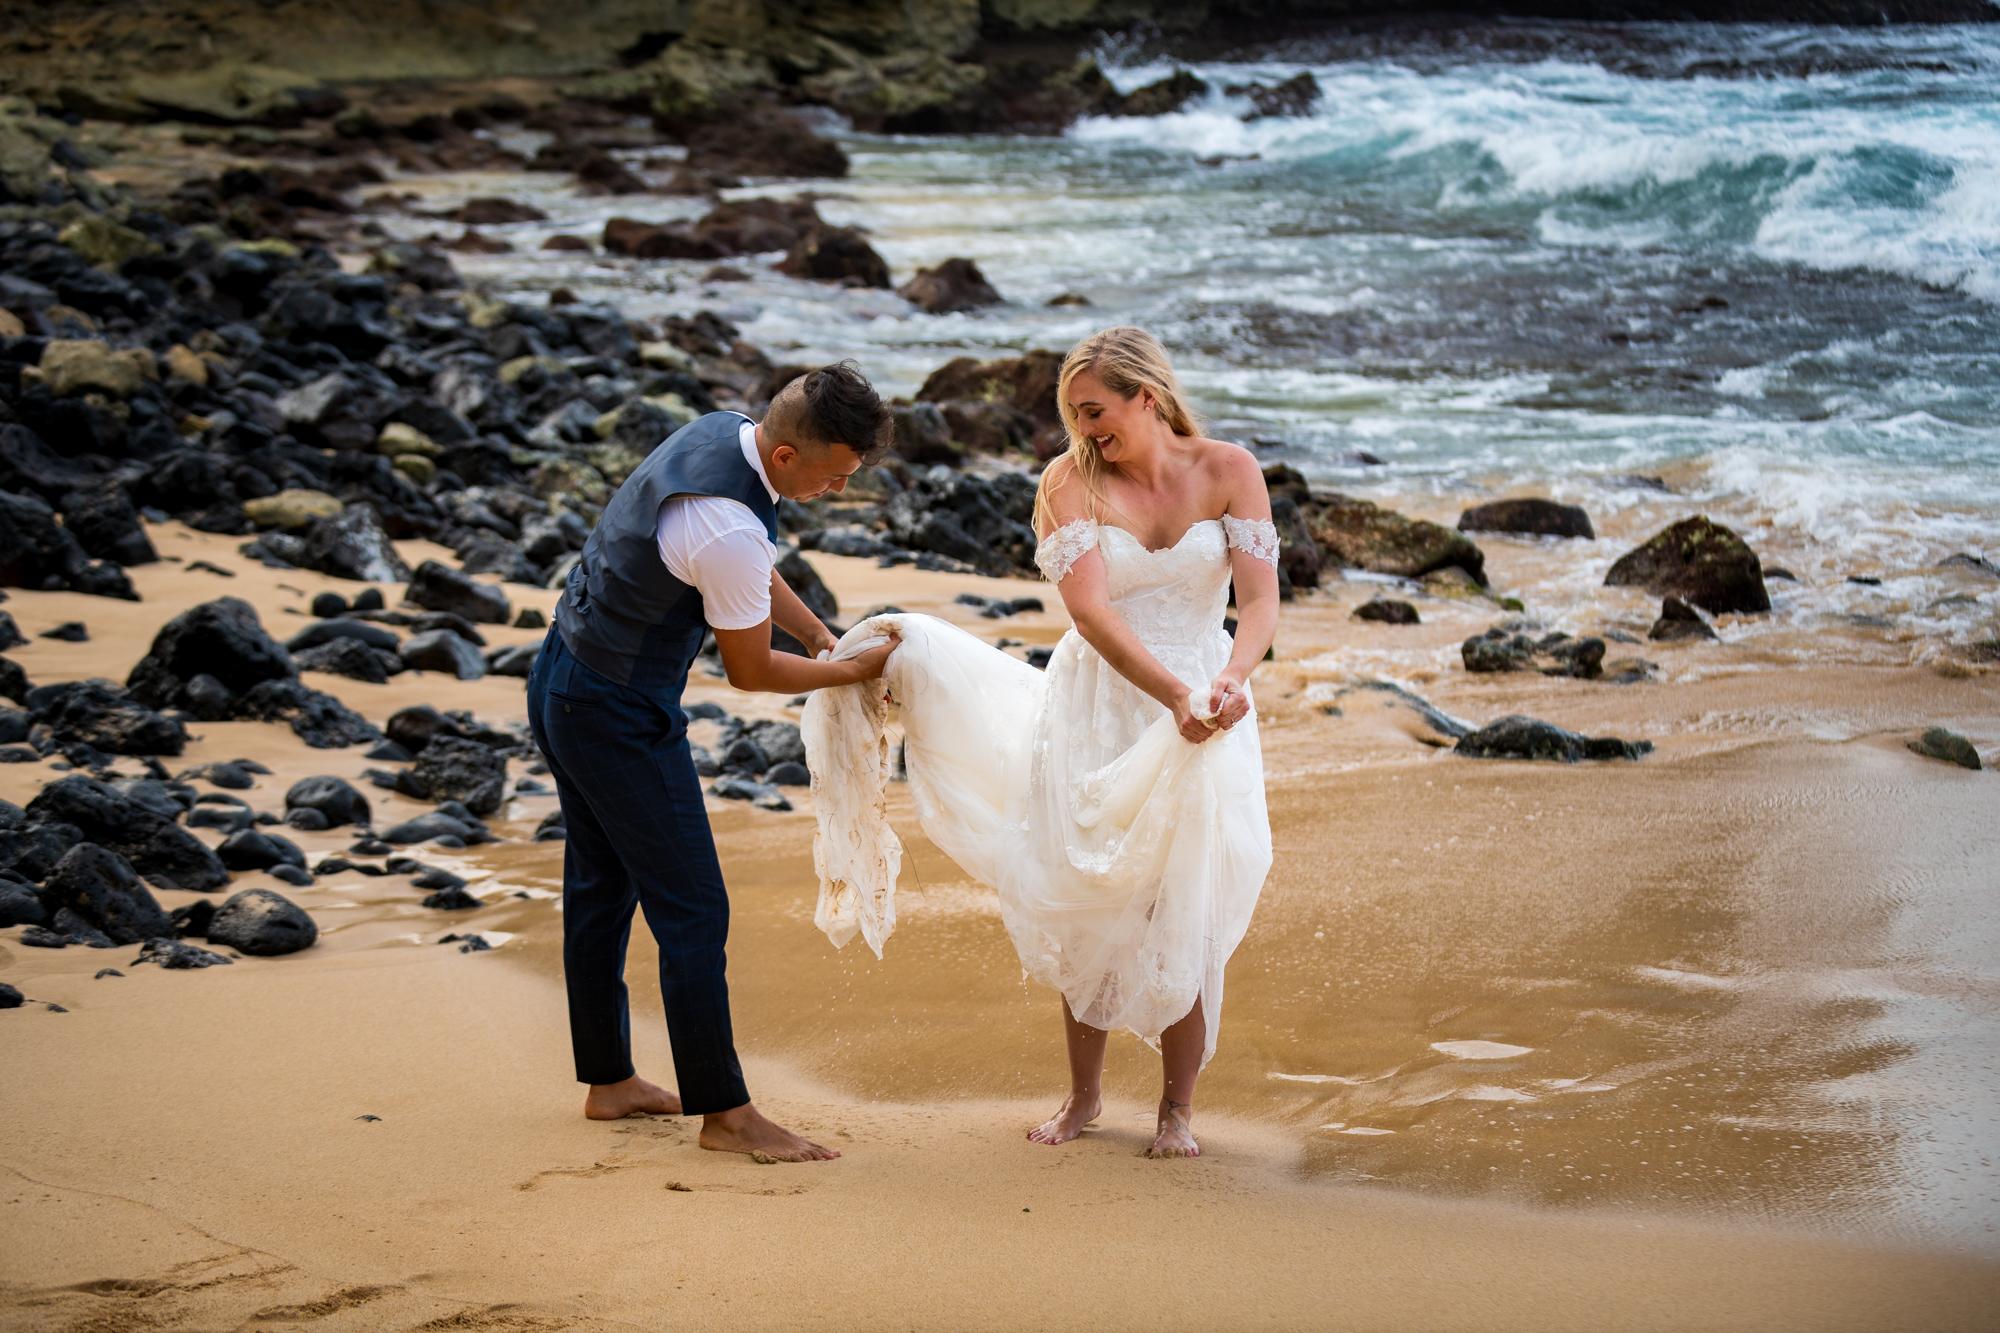 sunrise-wedding-coleen-shipwrecks-6-29-2919-9973.jpg